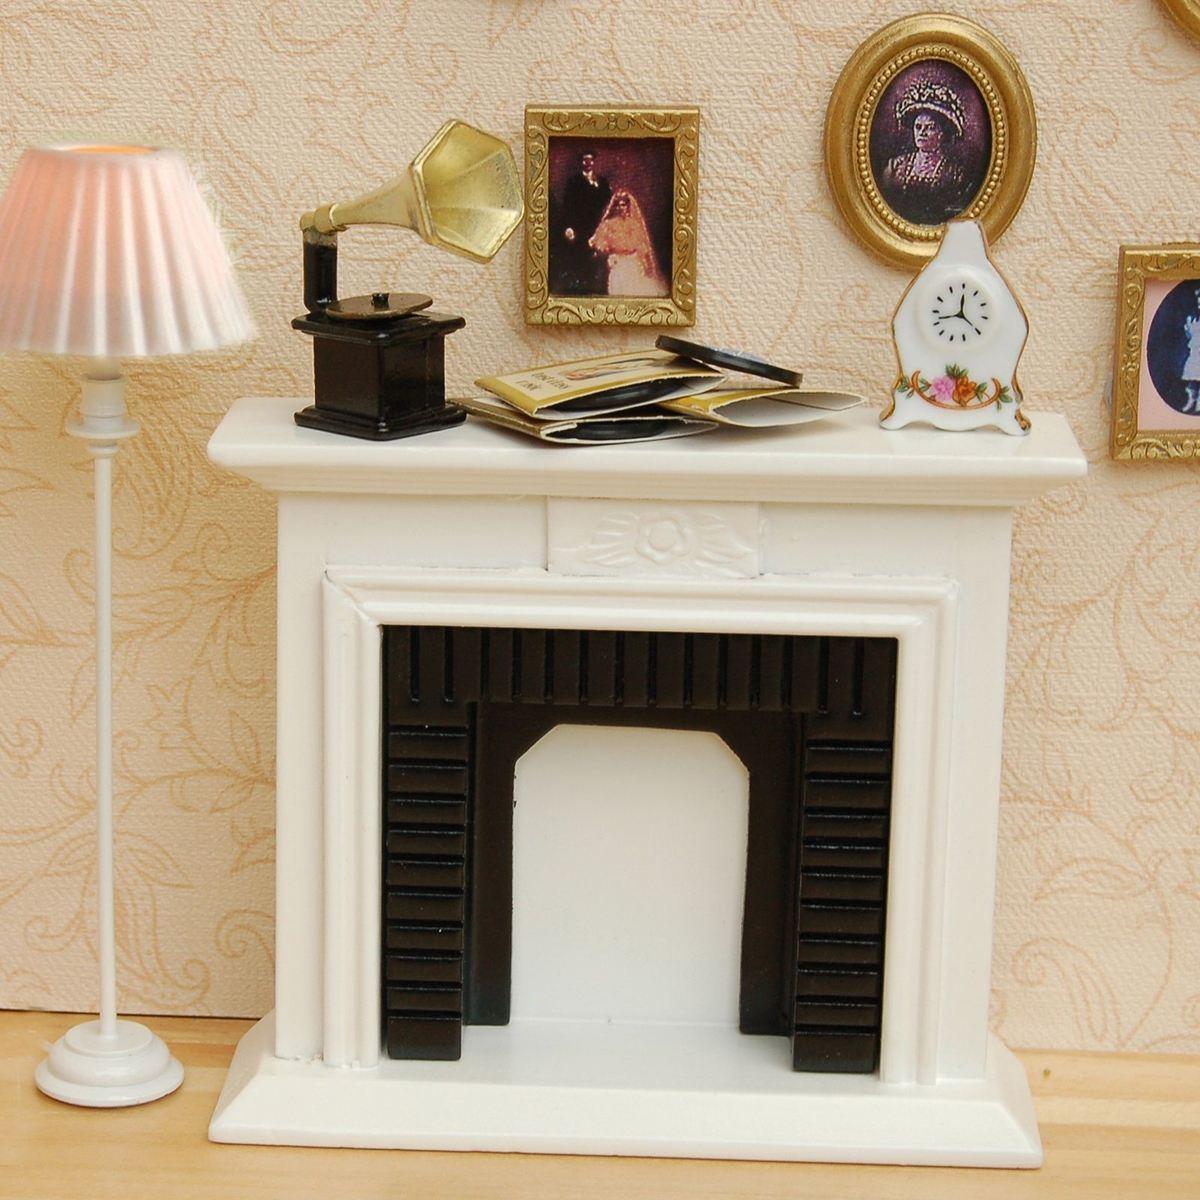 1/12 Scale DIY Handmade Miniature White Fireplace Dollhouse Decor Furniture Accessorie Kits Mini Toys Gift For Children hearth